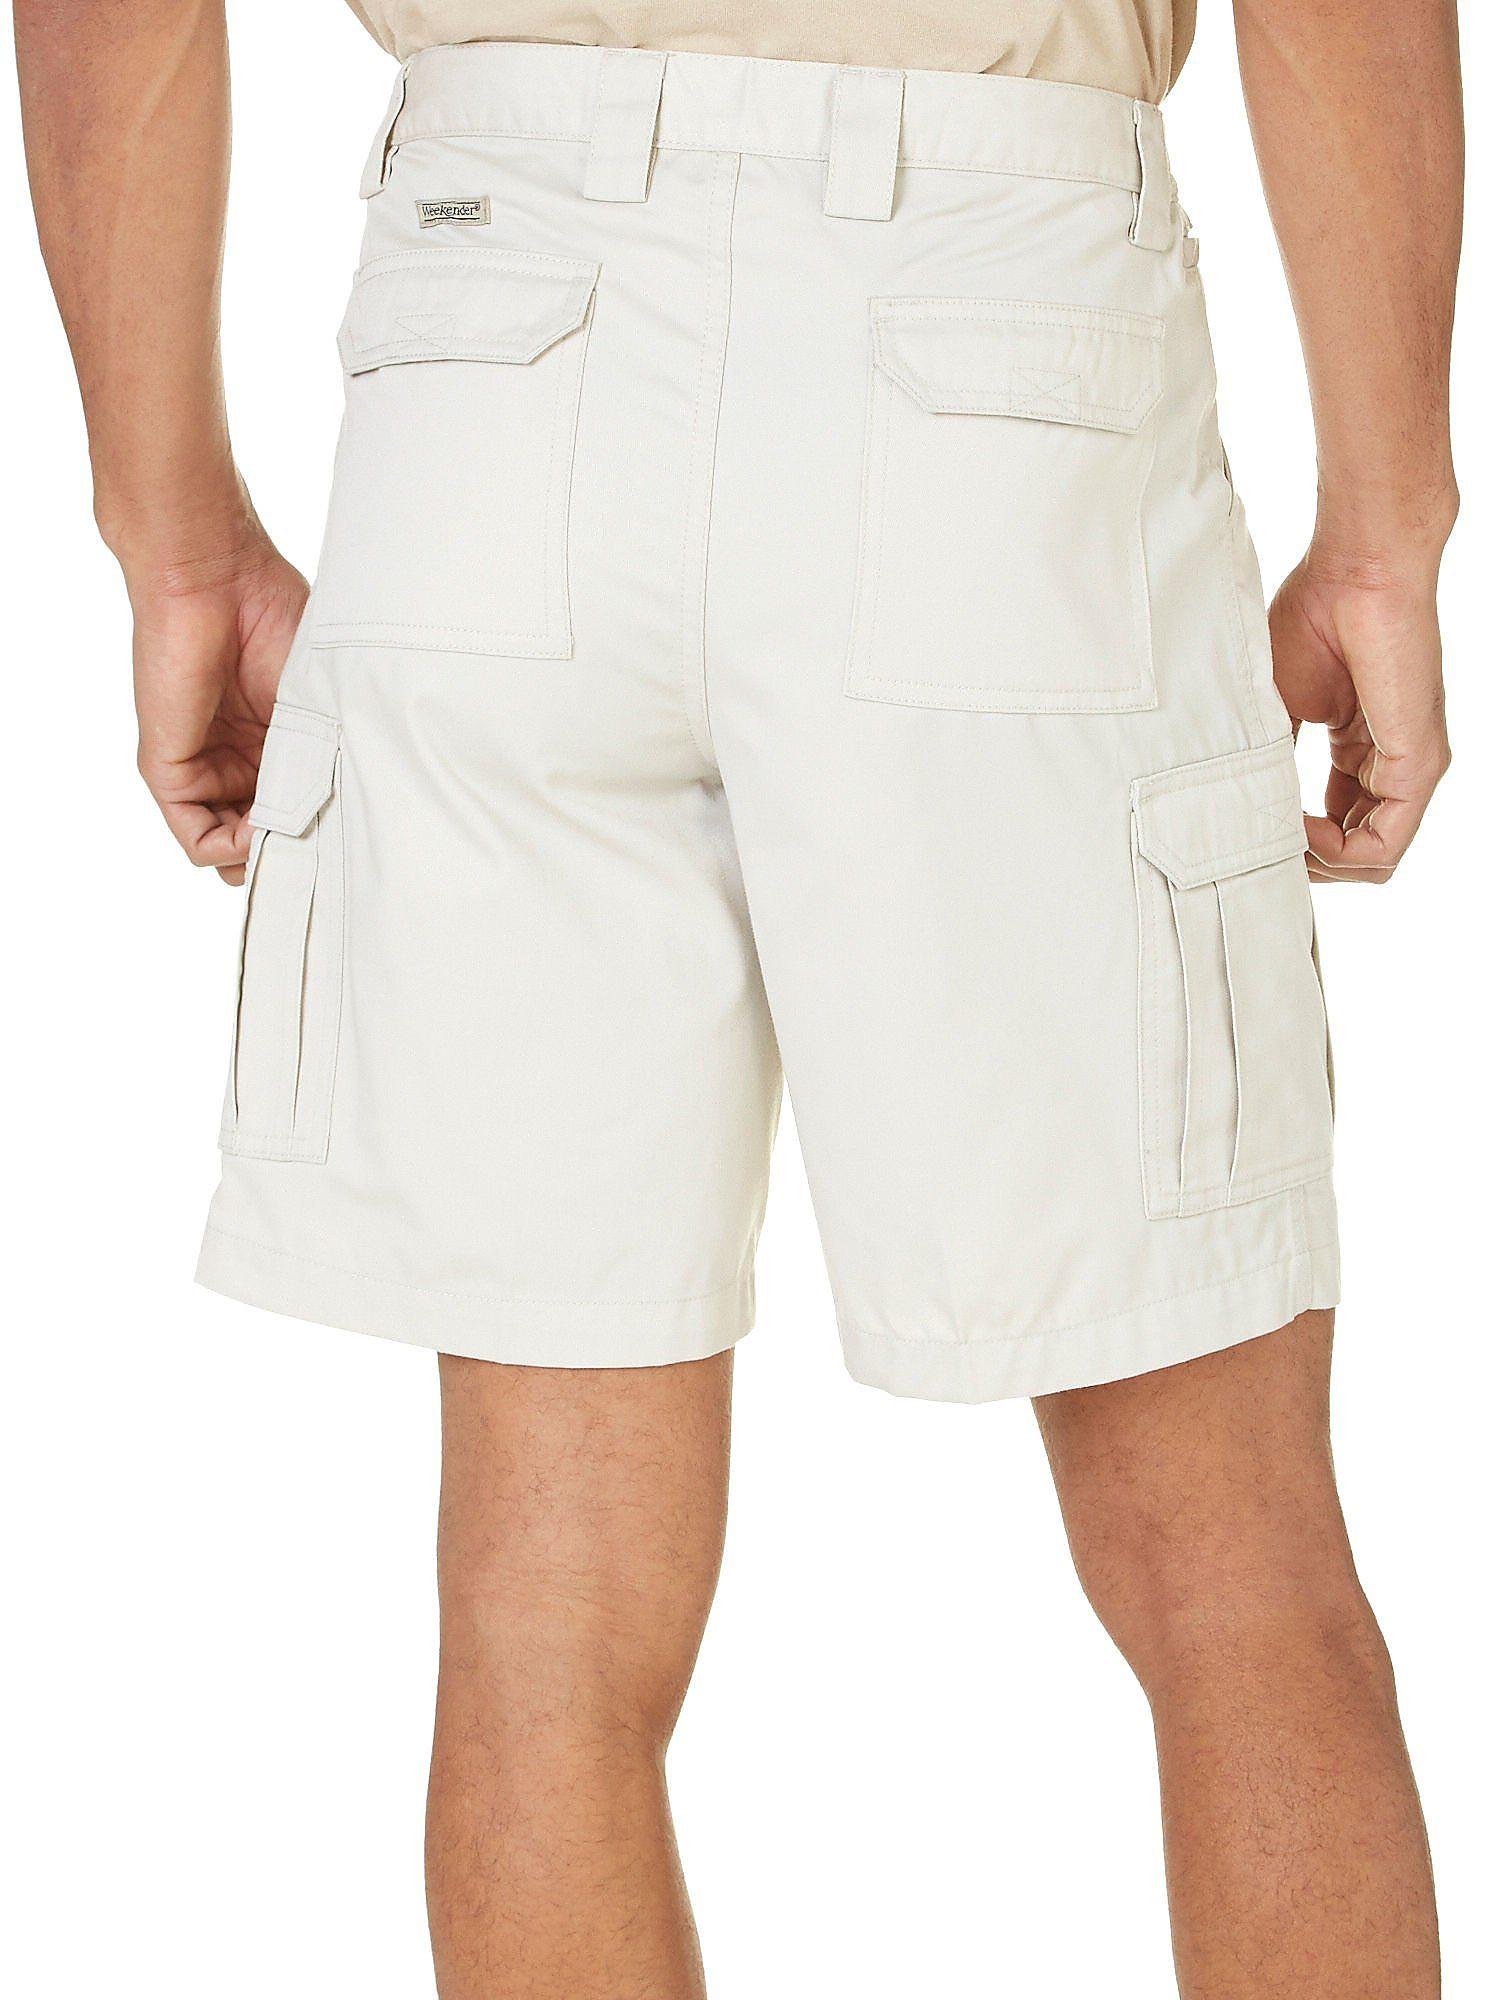 a4585dcc75 Weekender Mens Side Elastic Compass Shorts | eBay